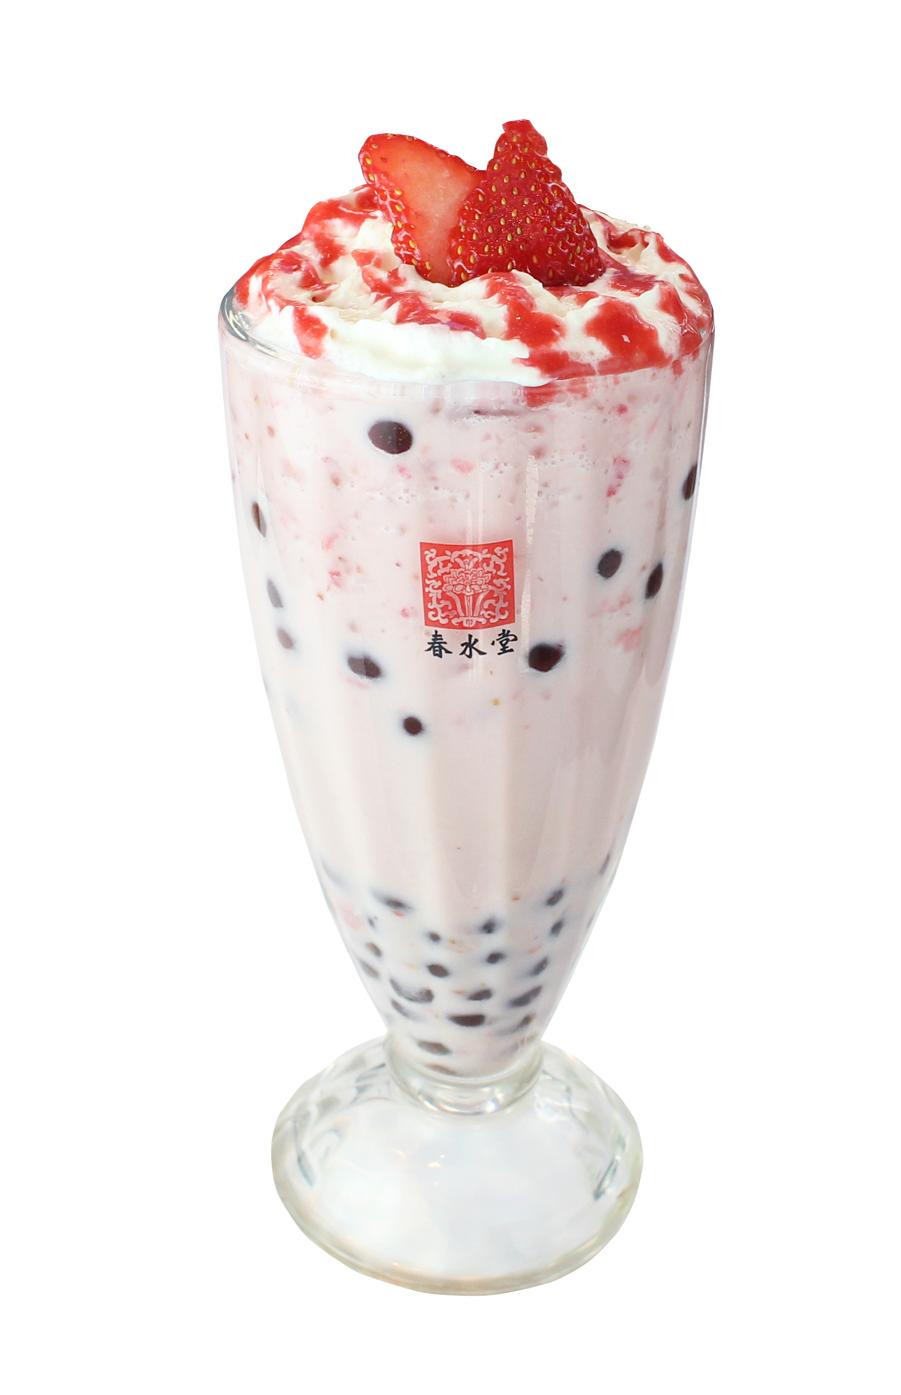 Falooda ice cream in bangalore dating 8